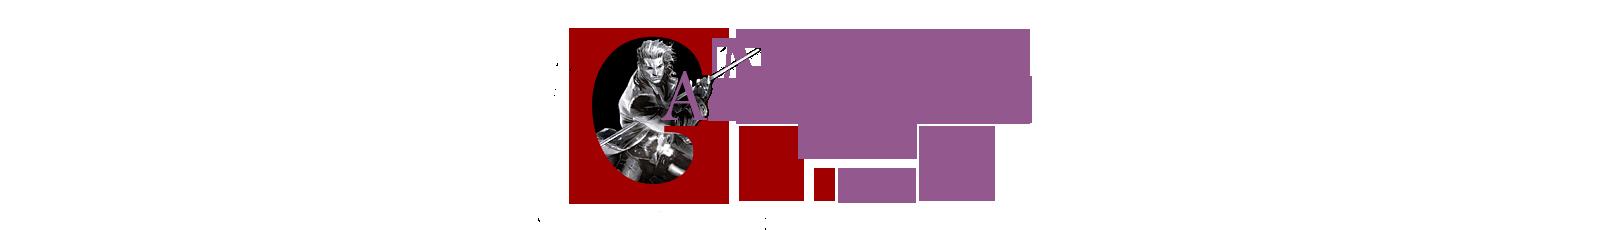 Gambit's Royal Flush Fanlisting